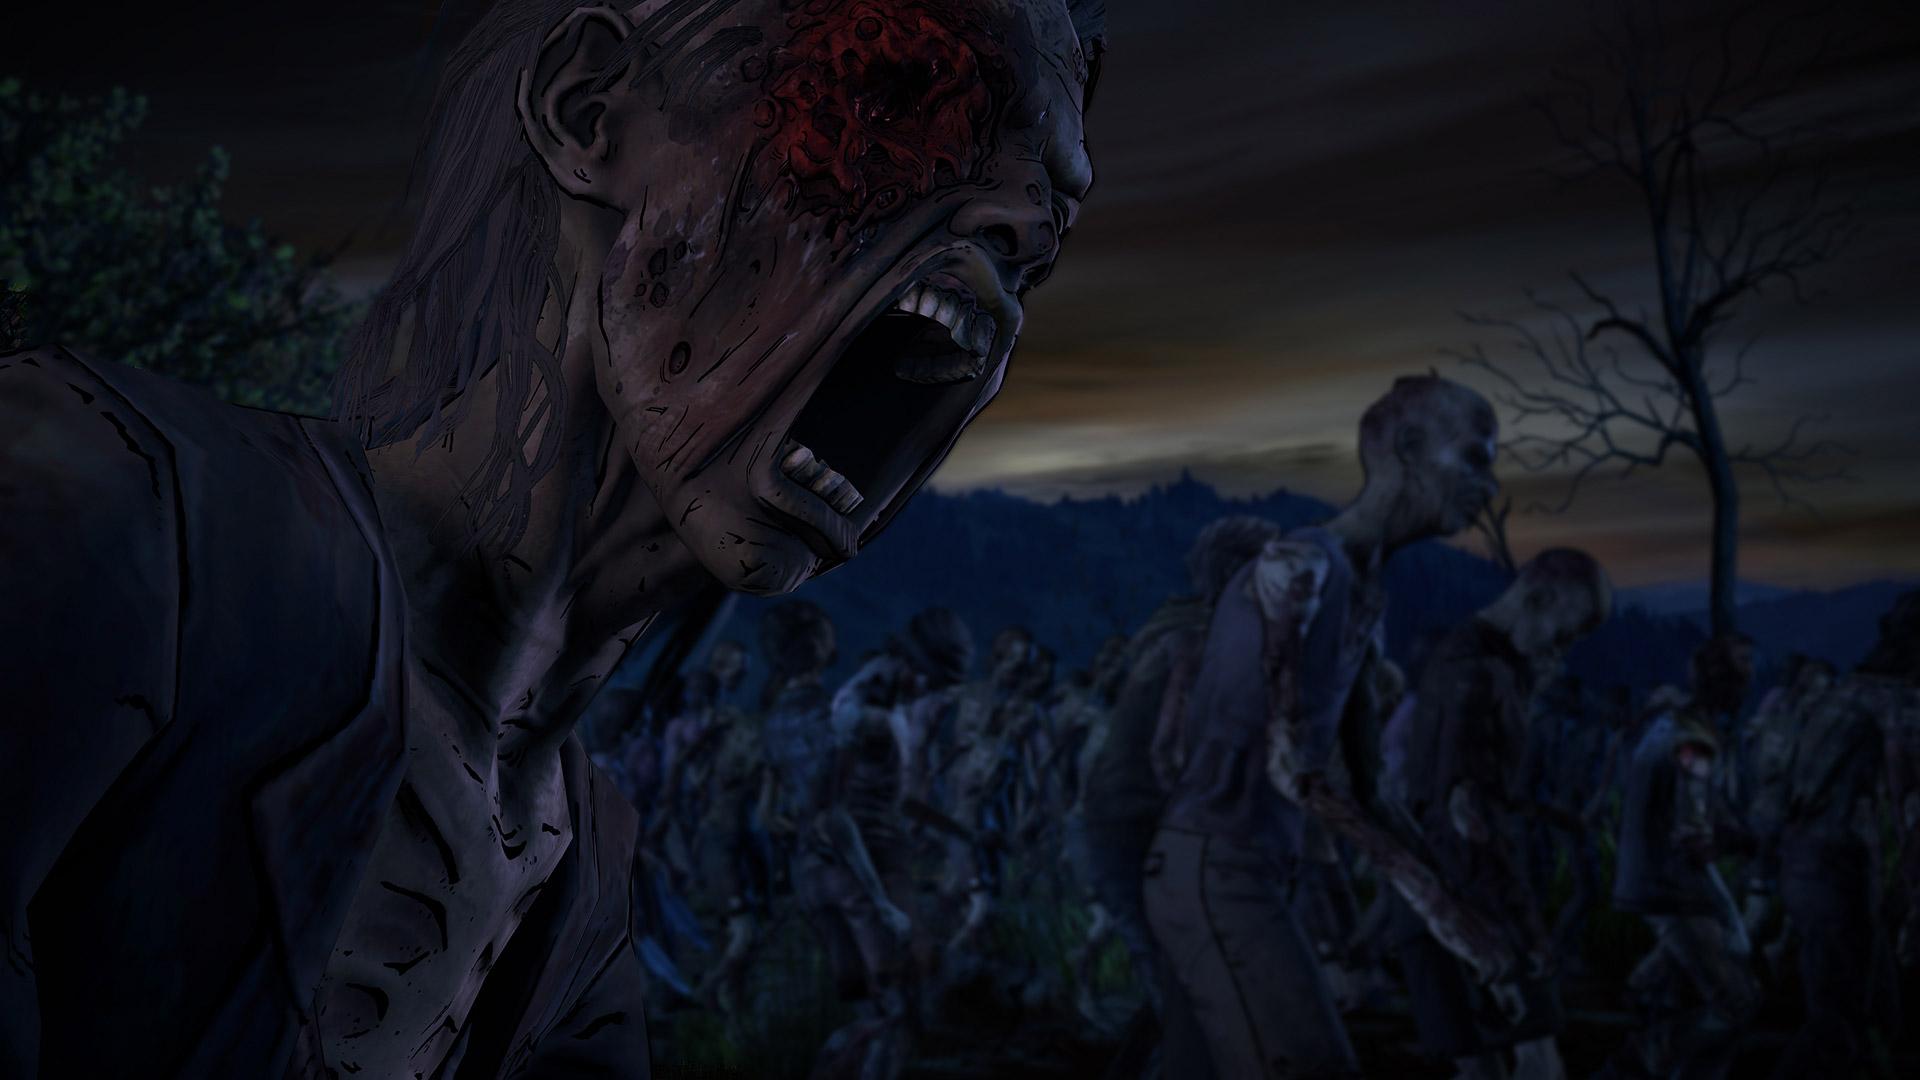 Free The Walking Dead: A New Frontier Wallpaper in 1920x1080